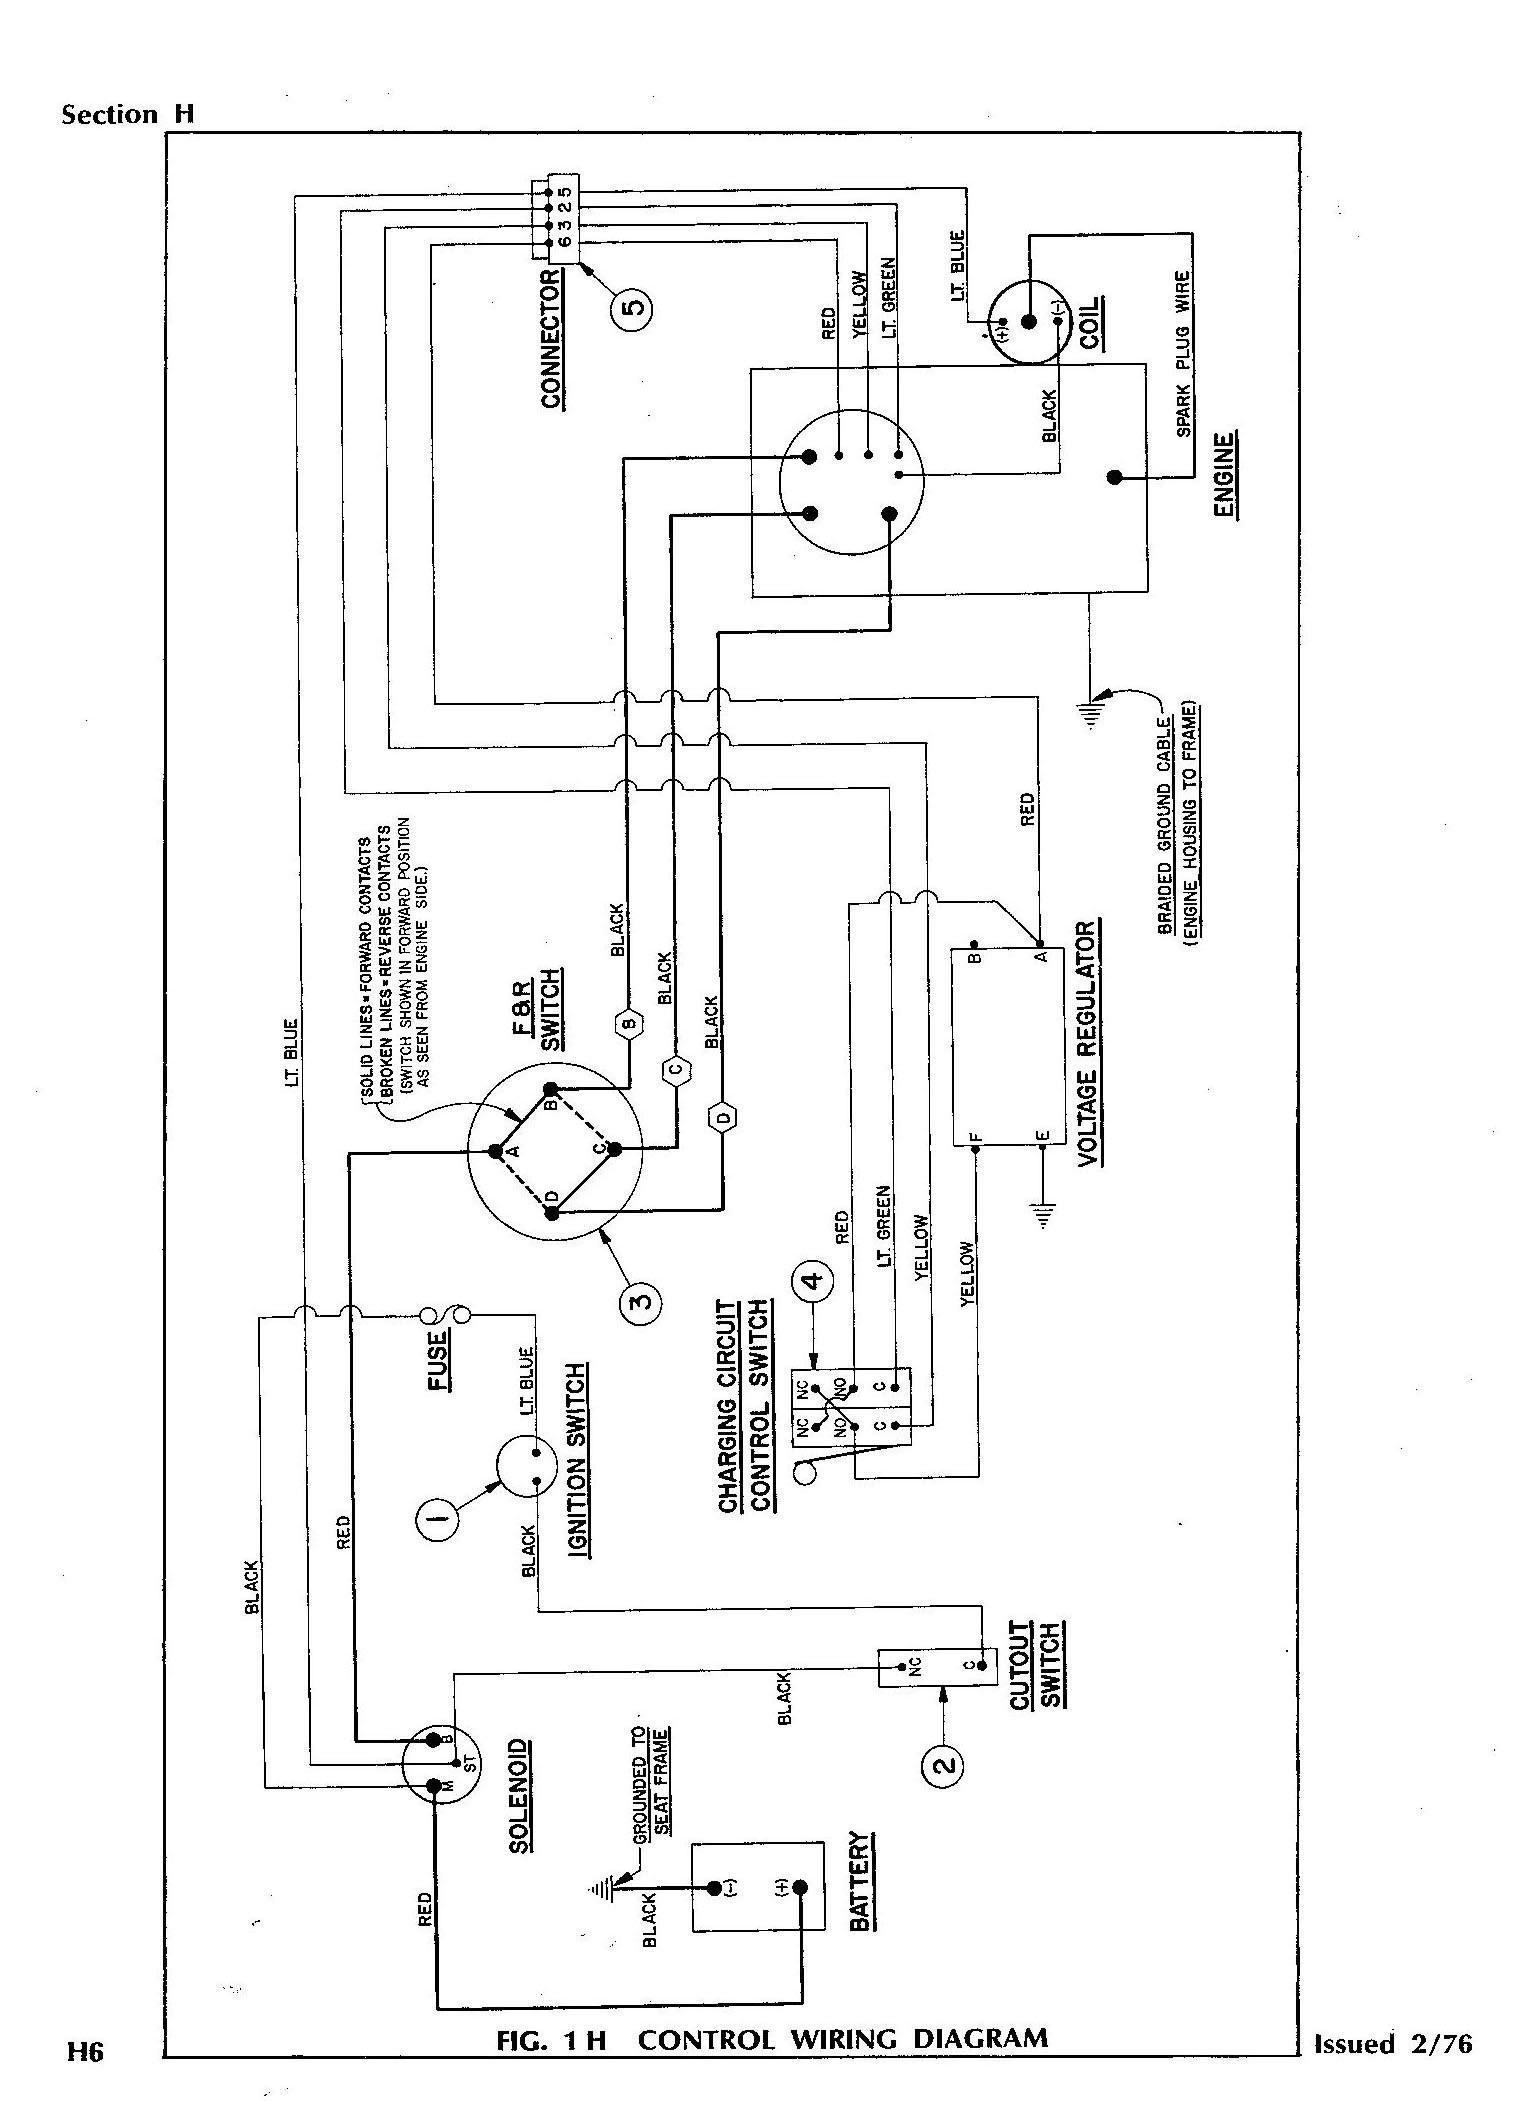 ez go gas wiring diagram oc 8376  related posts to ez go solenoid wiring diagram club car ez go gas wiring diagram download free ez go solenoid wiring diagram club car